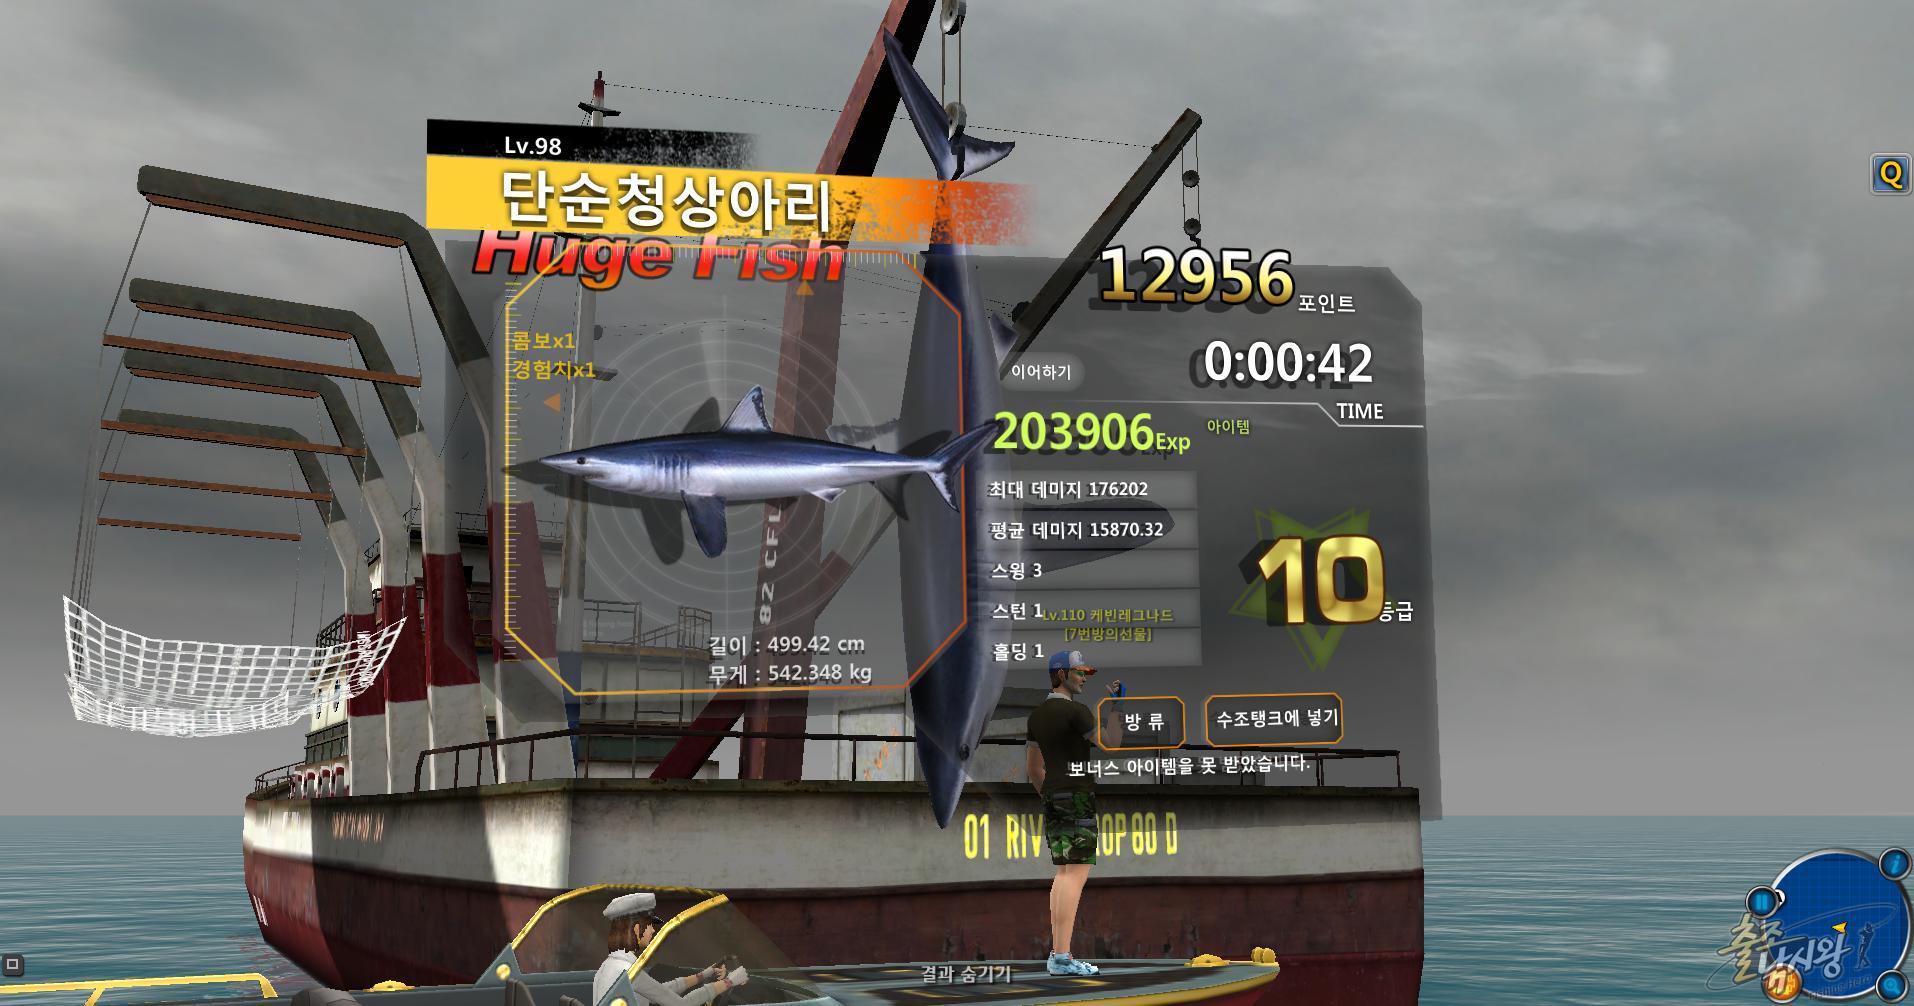 FishingHero_0071.jpg